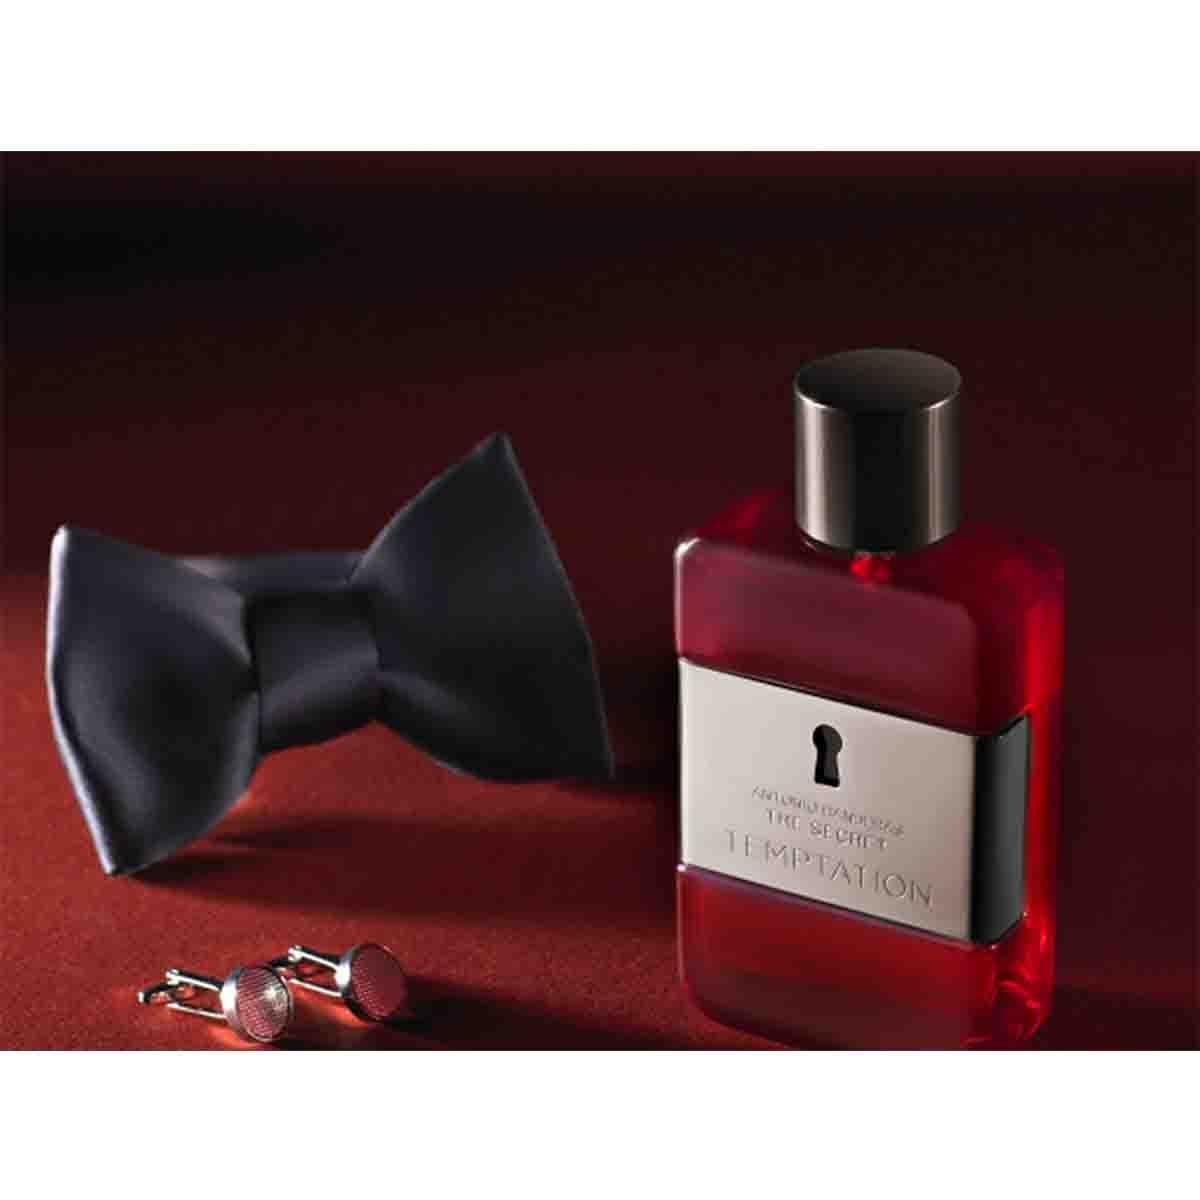 Estuche para Caballero Antonio Banderas The Secret Temptation Edt 100 Ml + After Shave 75 Ml